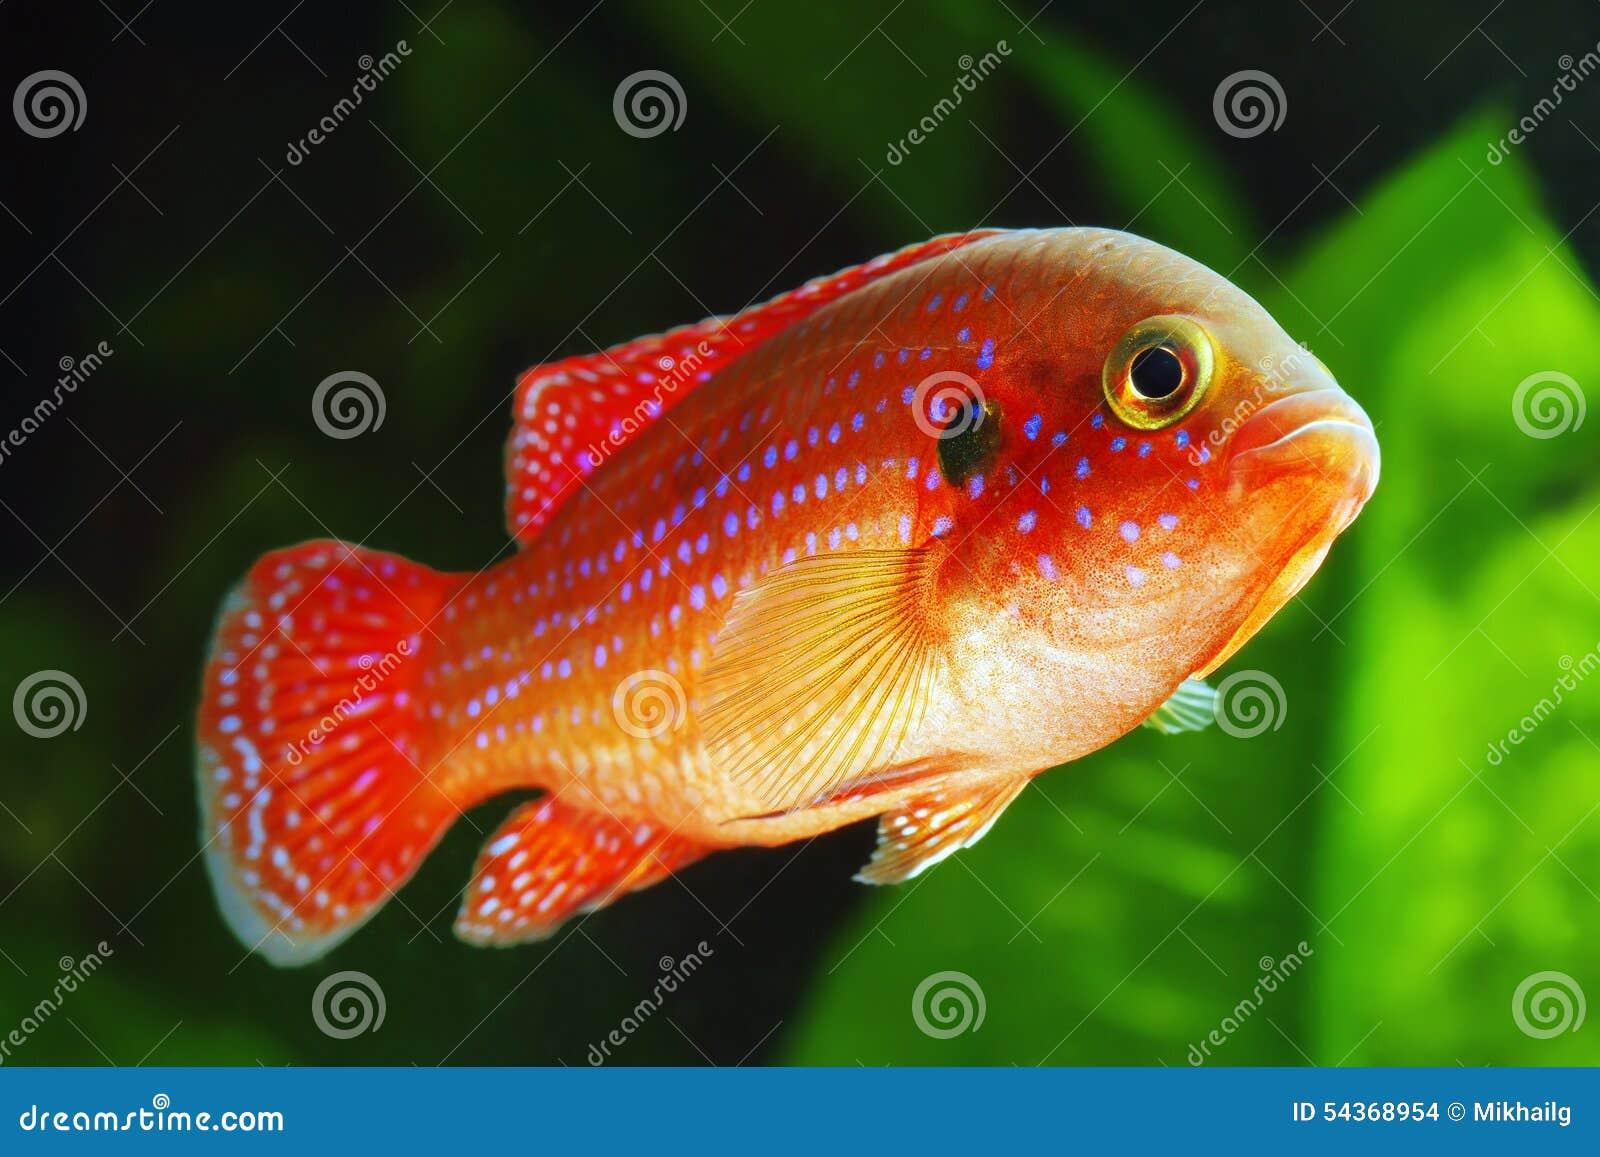 Freshwater jewel fish - African Jewelfish Stock Images